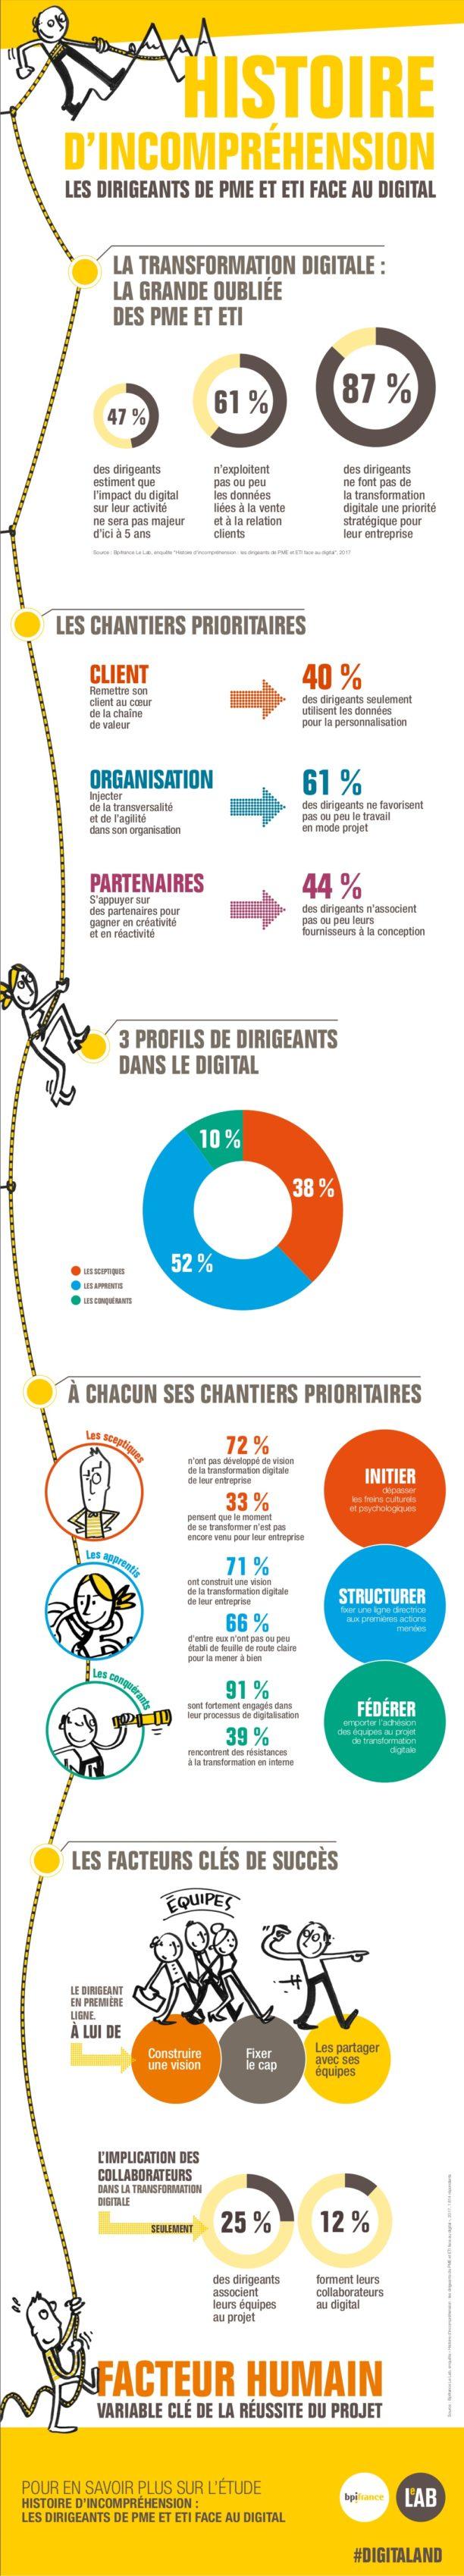 infographie-digital-pme-eti-612x3398